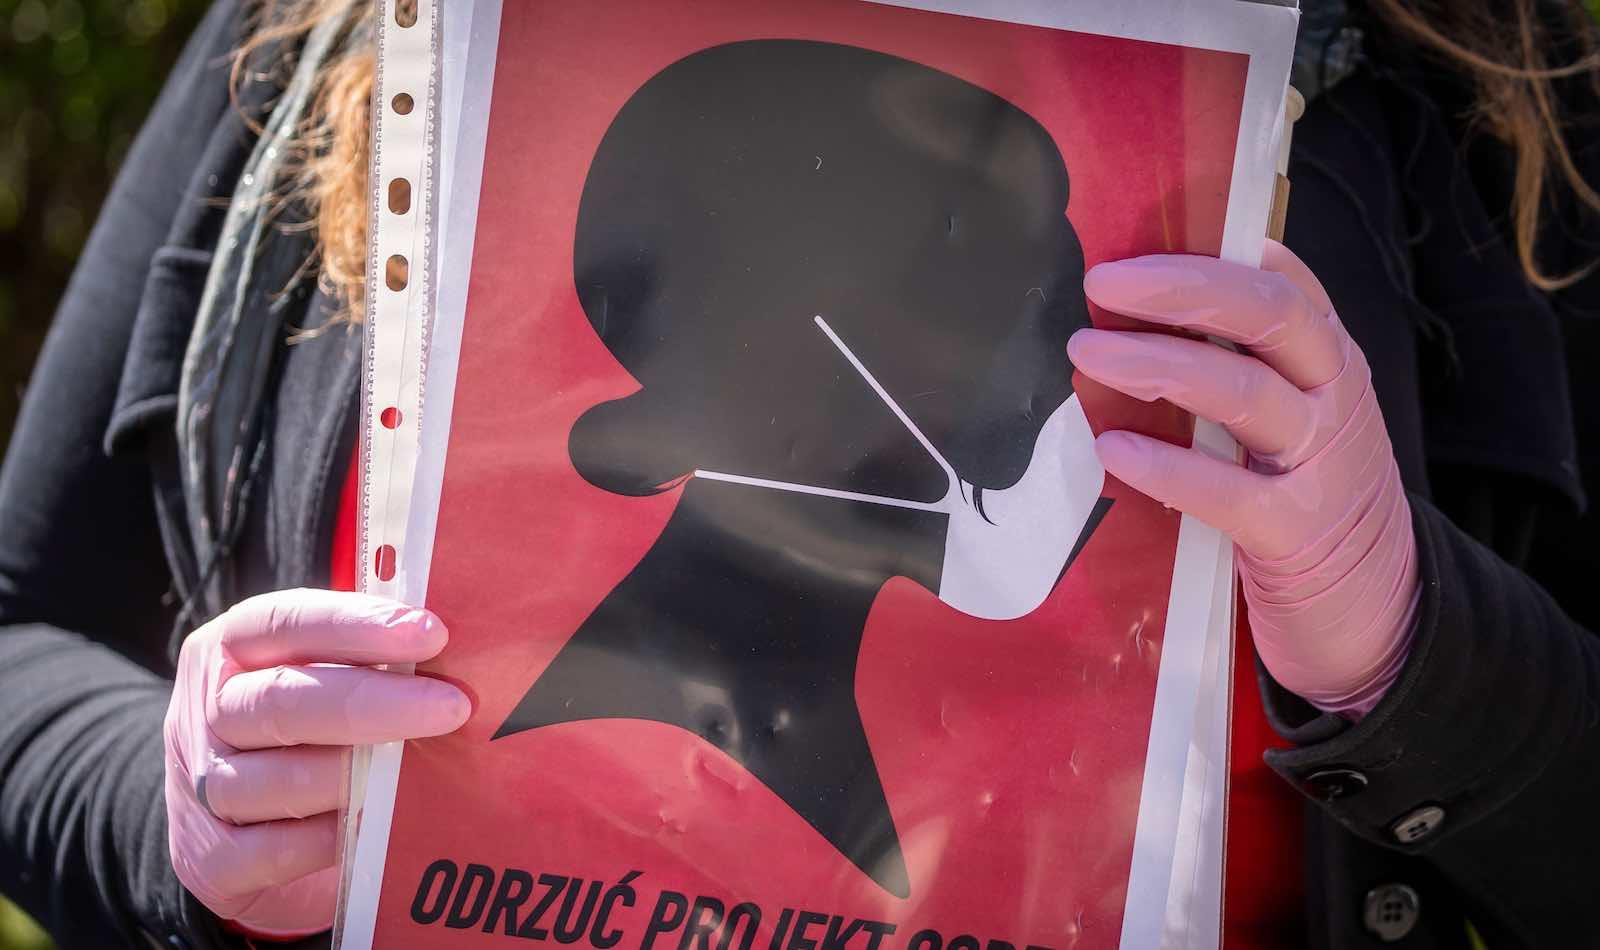 Demonstrators in Poland protest further curbs on reproductive rights amid coronavirus lockdown (Wojtek Radwanski/AFP/Getty Images)